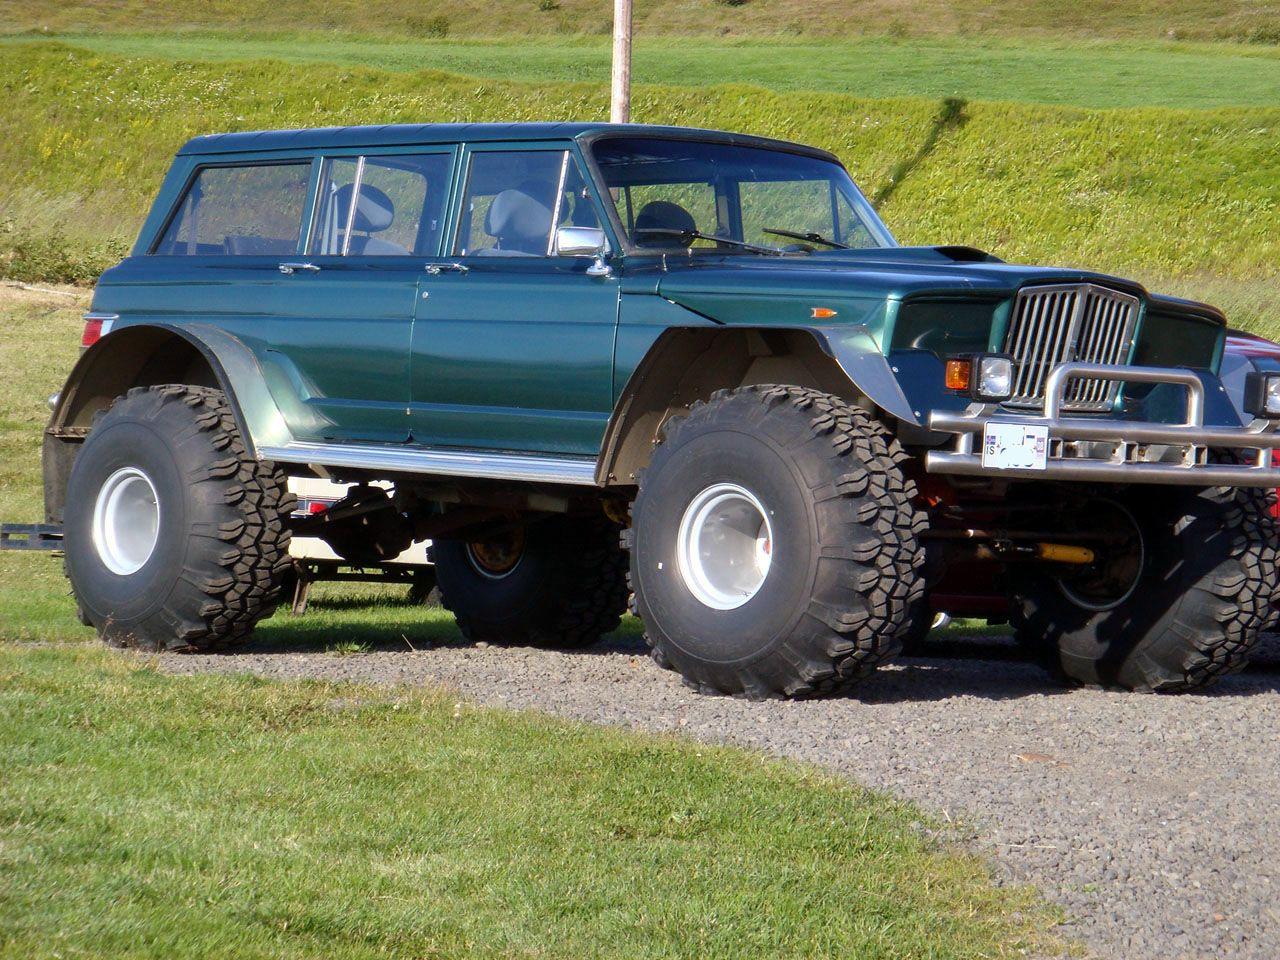 Exceedingly Cool Icelandic Wagoneer International Full